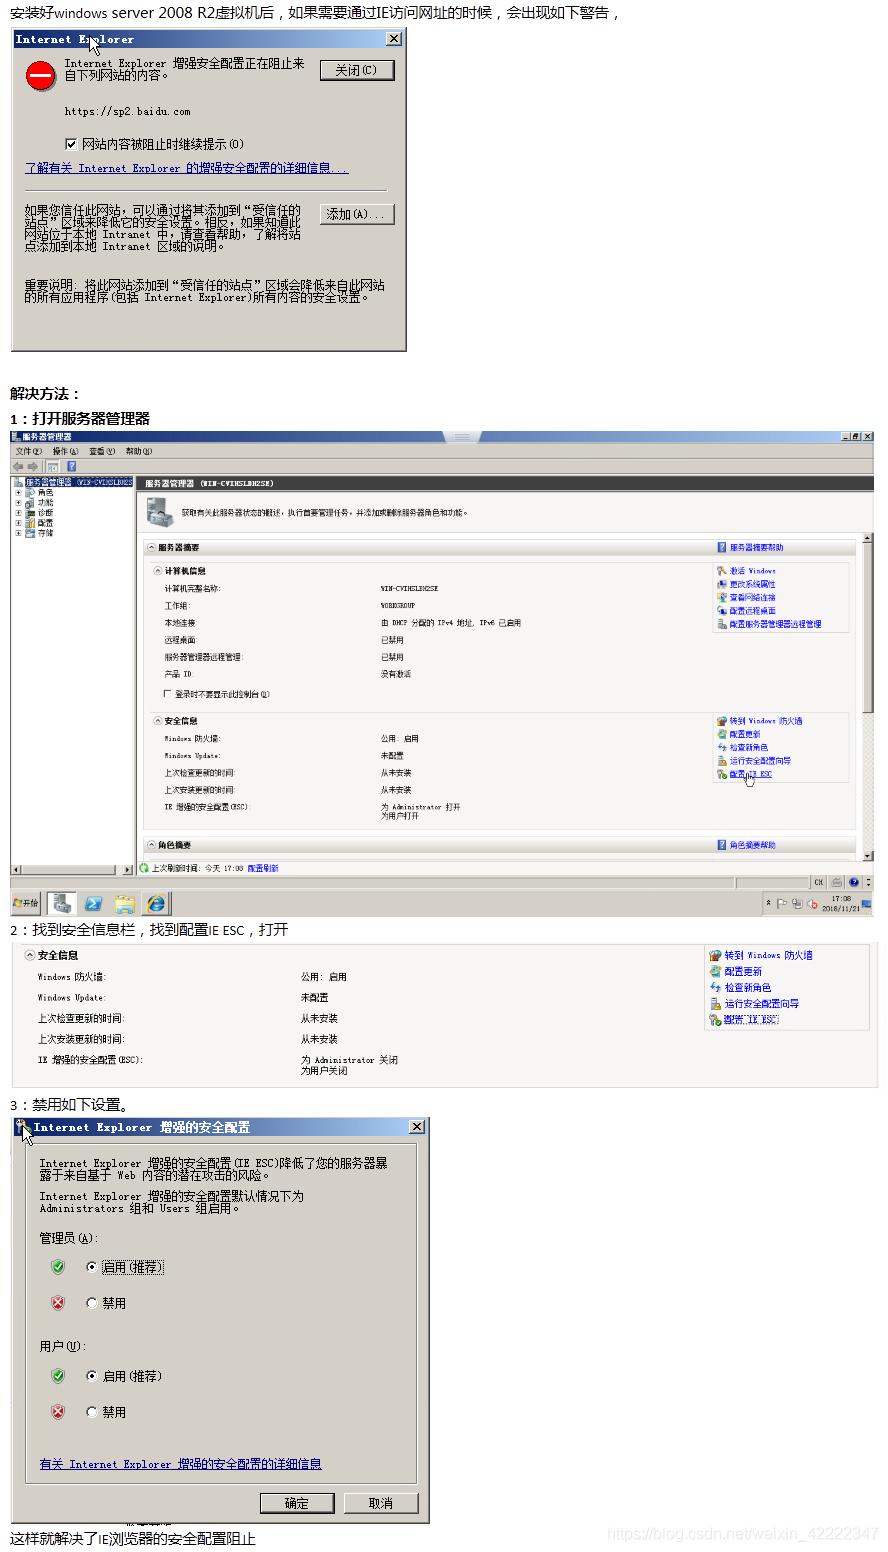 windows2008 IE浏览器 增强安全配置阻止